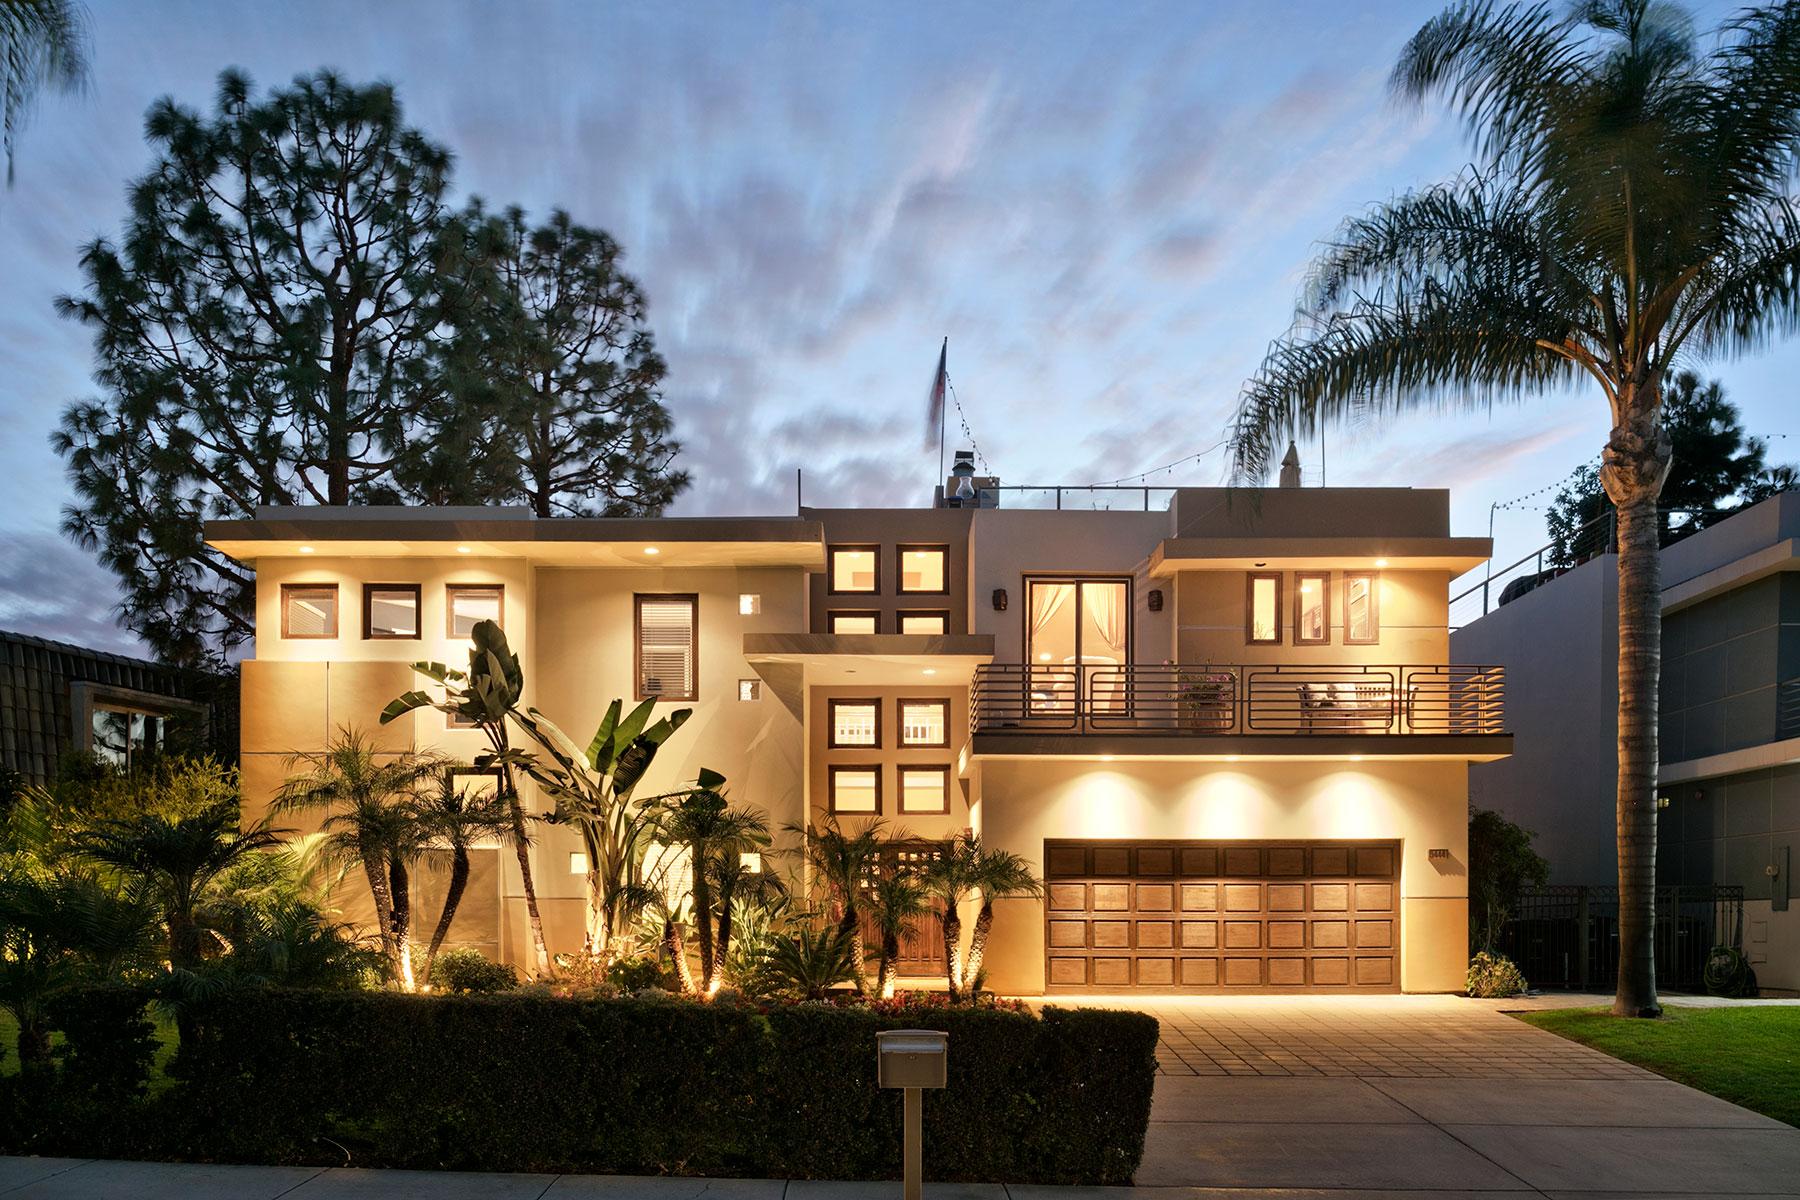 Maison unifamiliale pour l Vente à 34441 Camino Capistano 34441 Camino Capistrano Dana Point, Californie, 92624 États-Unis